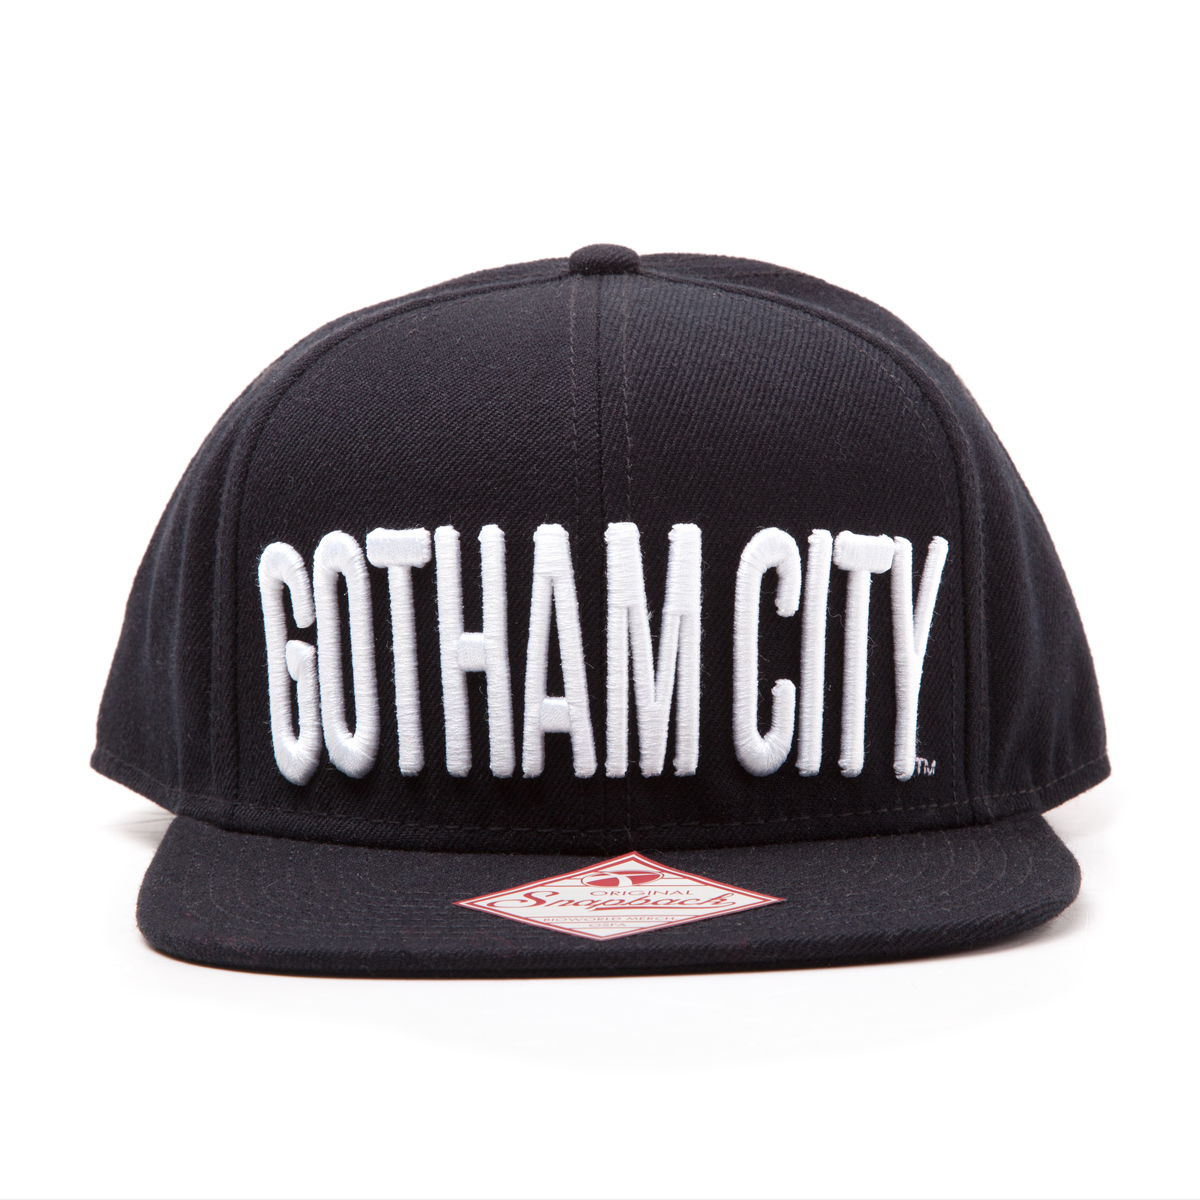 Batman - Gotham City Snapback